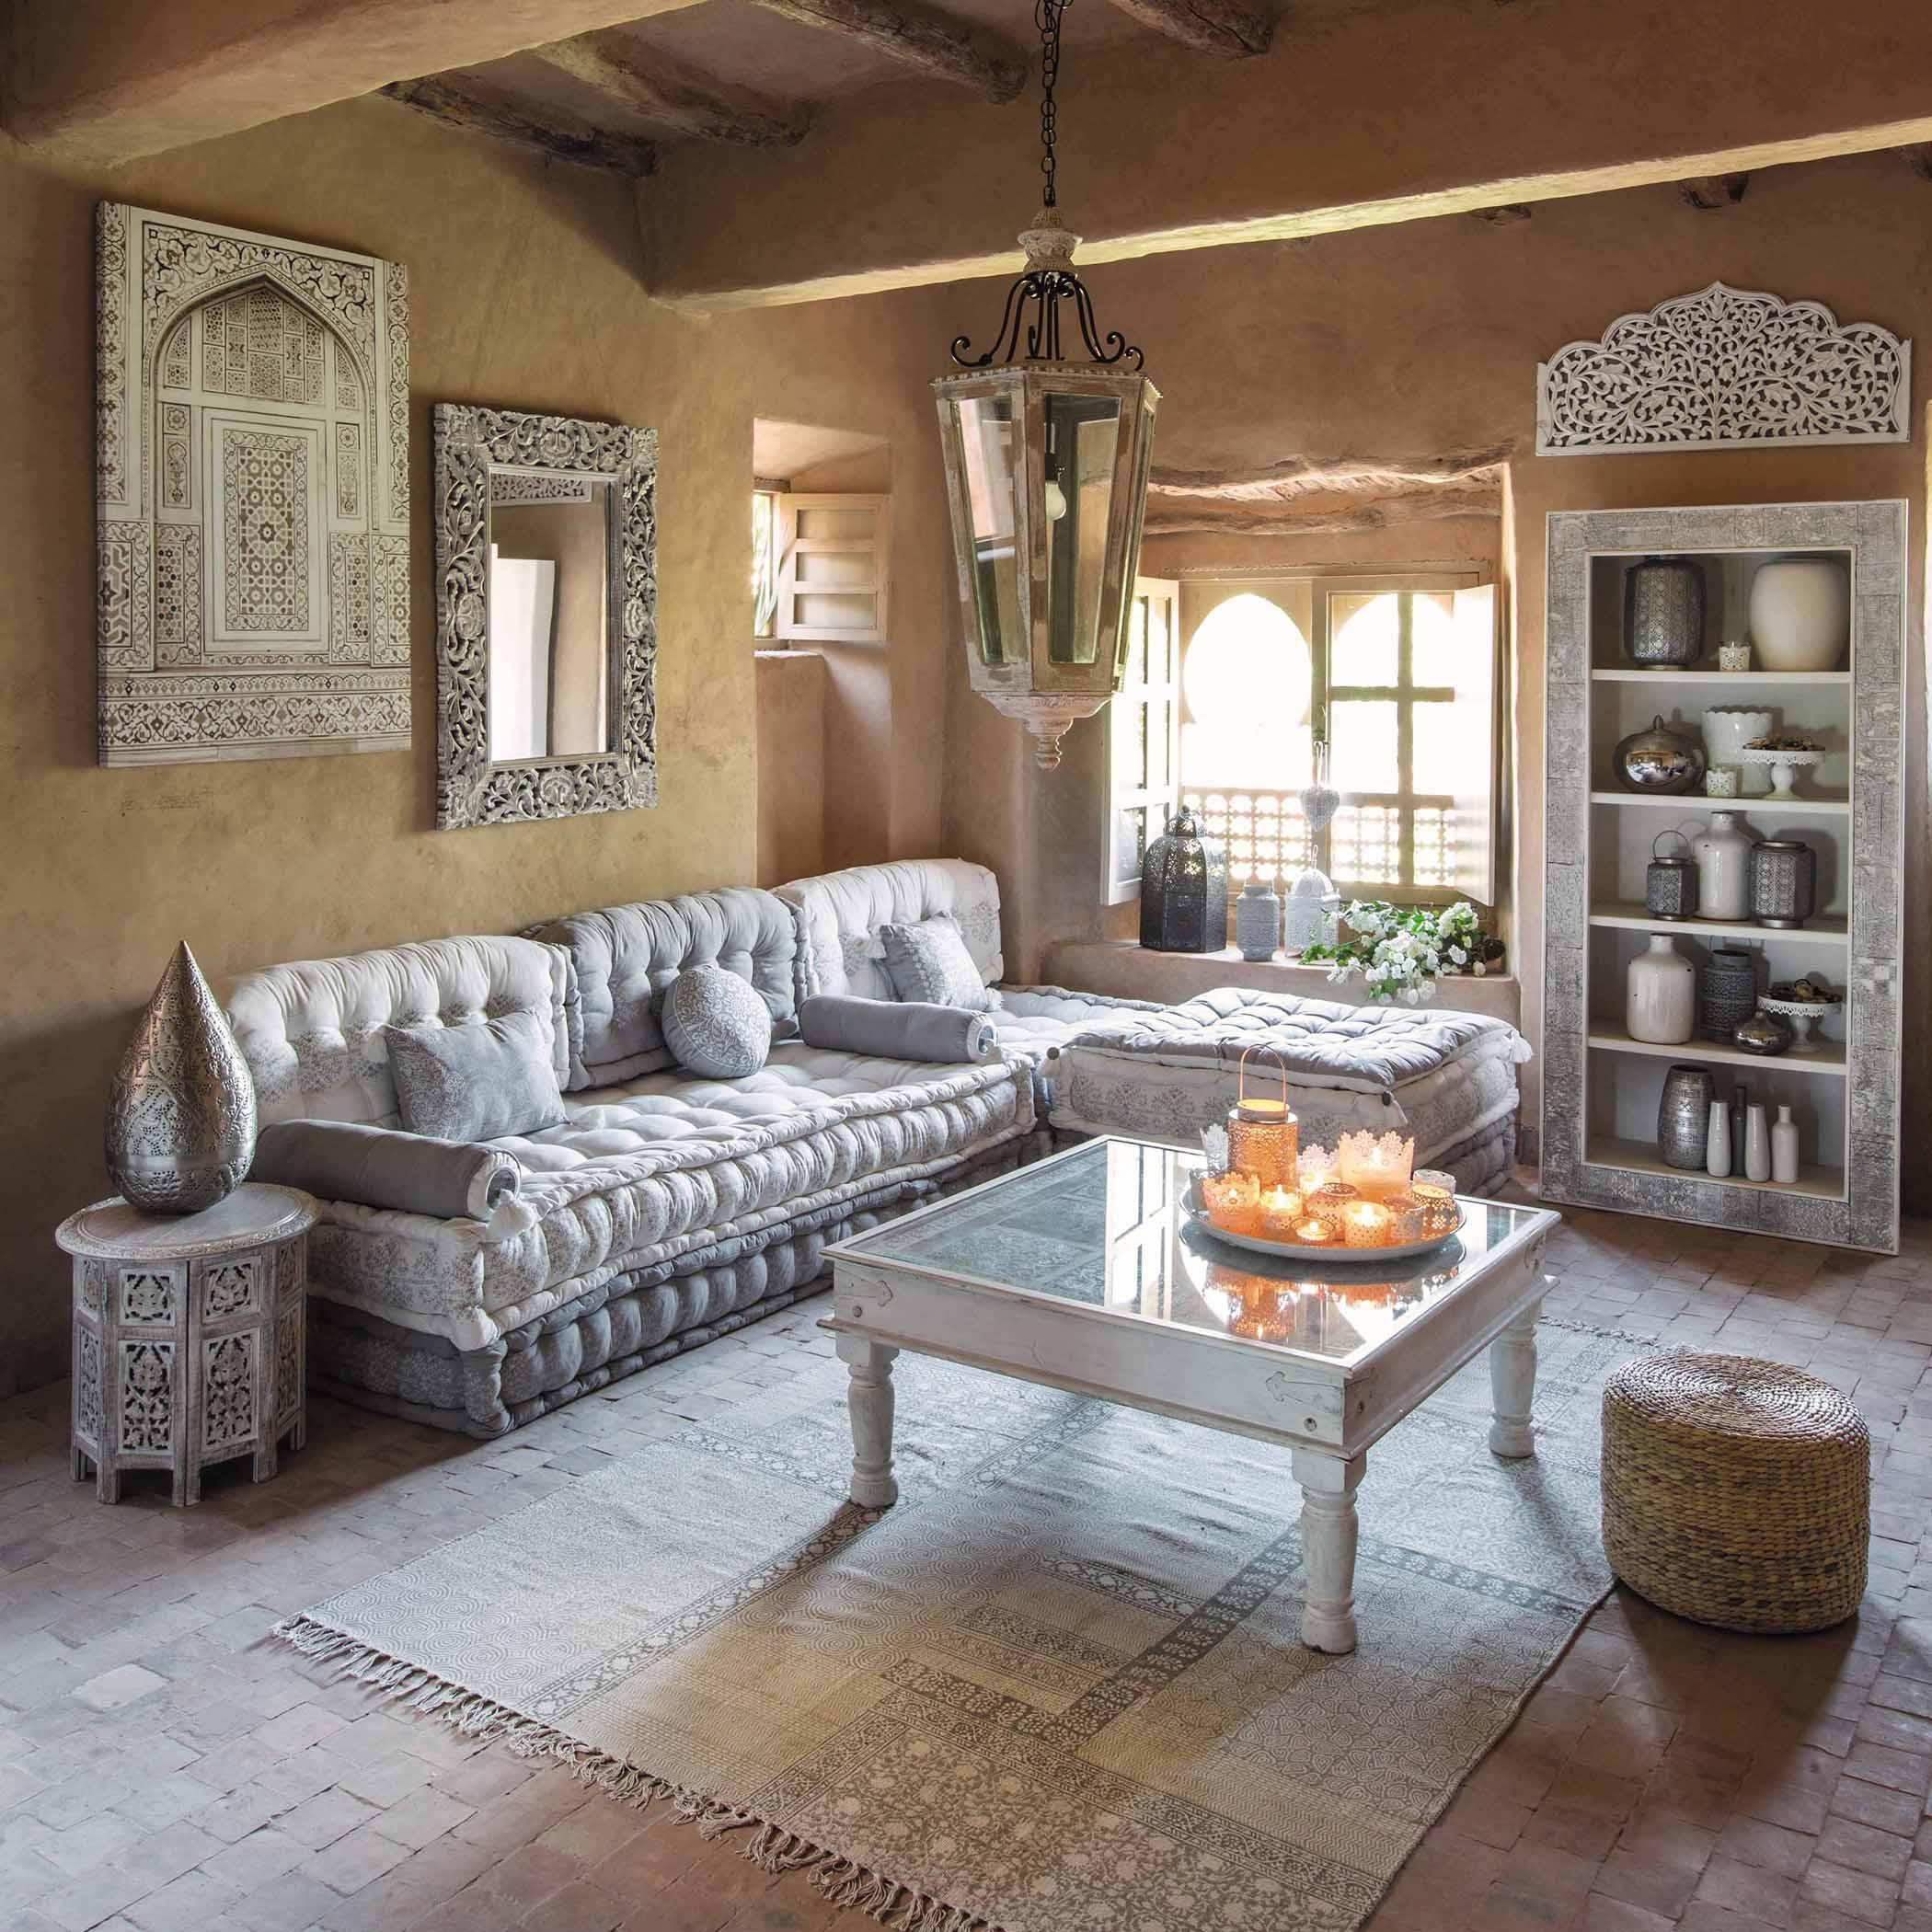 orientalische deko bilder ideen couchstyle. Black Bedroom Furniture Sets. Home Design Ideas